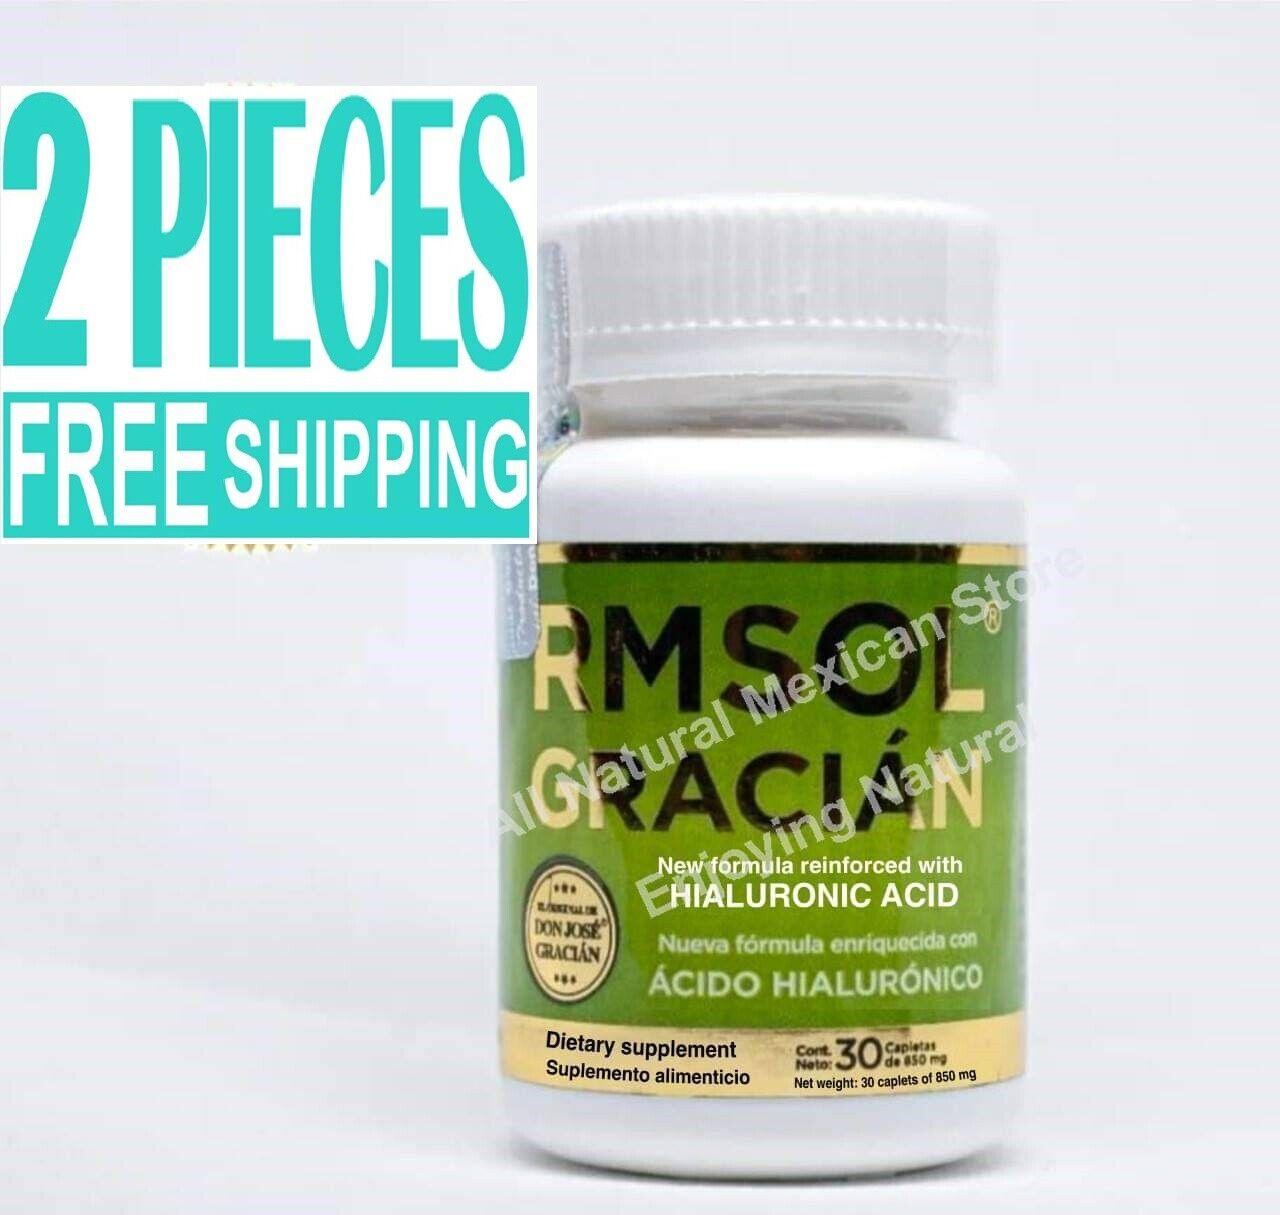 2 pieces RMSOL GRACIAN ACIDO HIALURONIC whit TUMERIC ROOT Arthritis Joint Pain